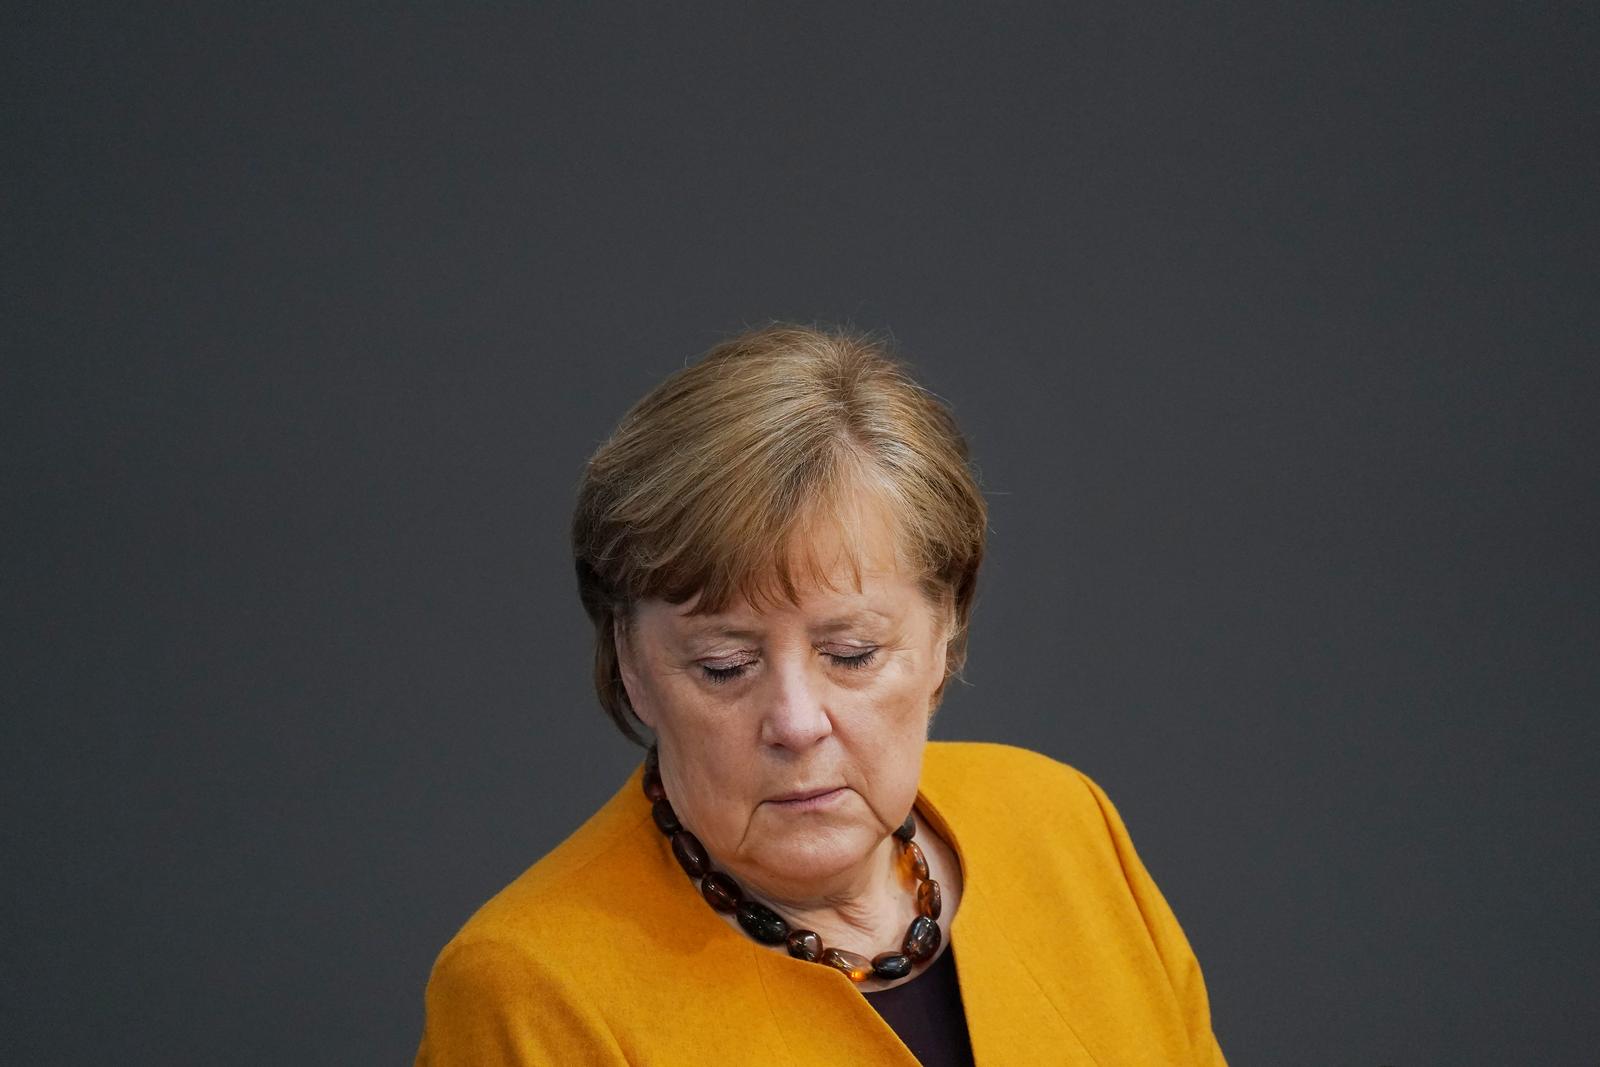 Merkel Takes Questions At Bundestag Following Reversal Of Easter Shutdown